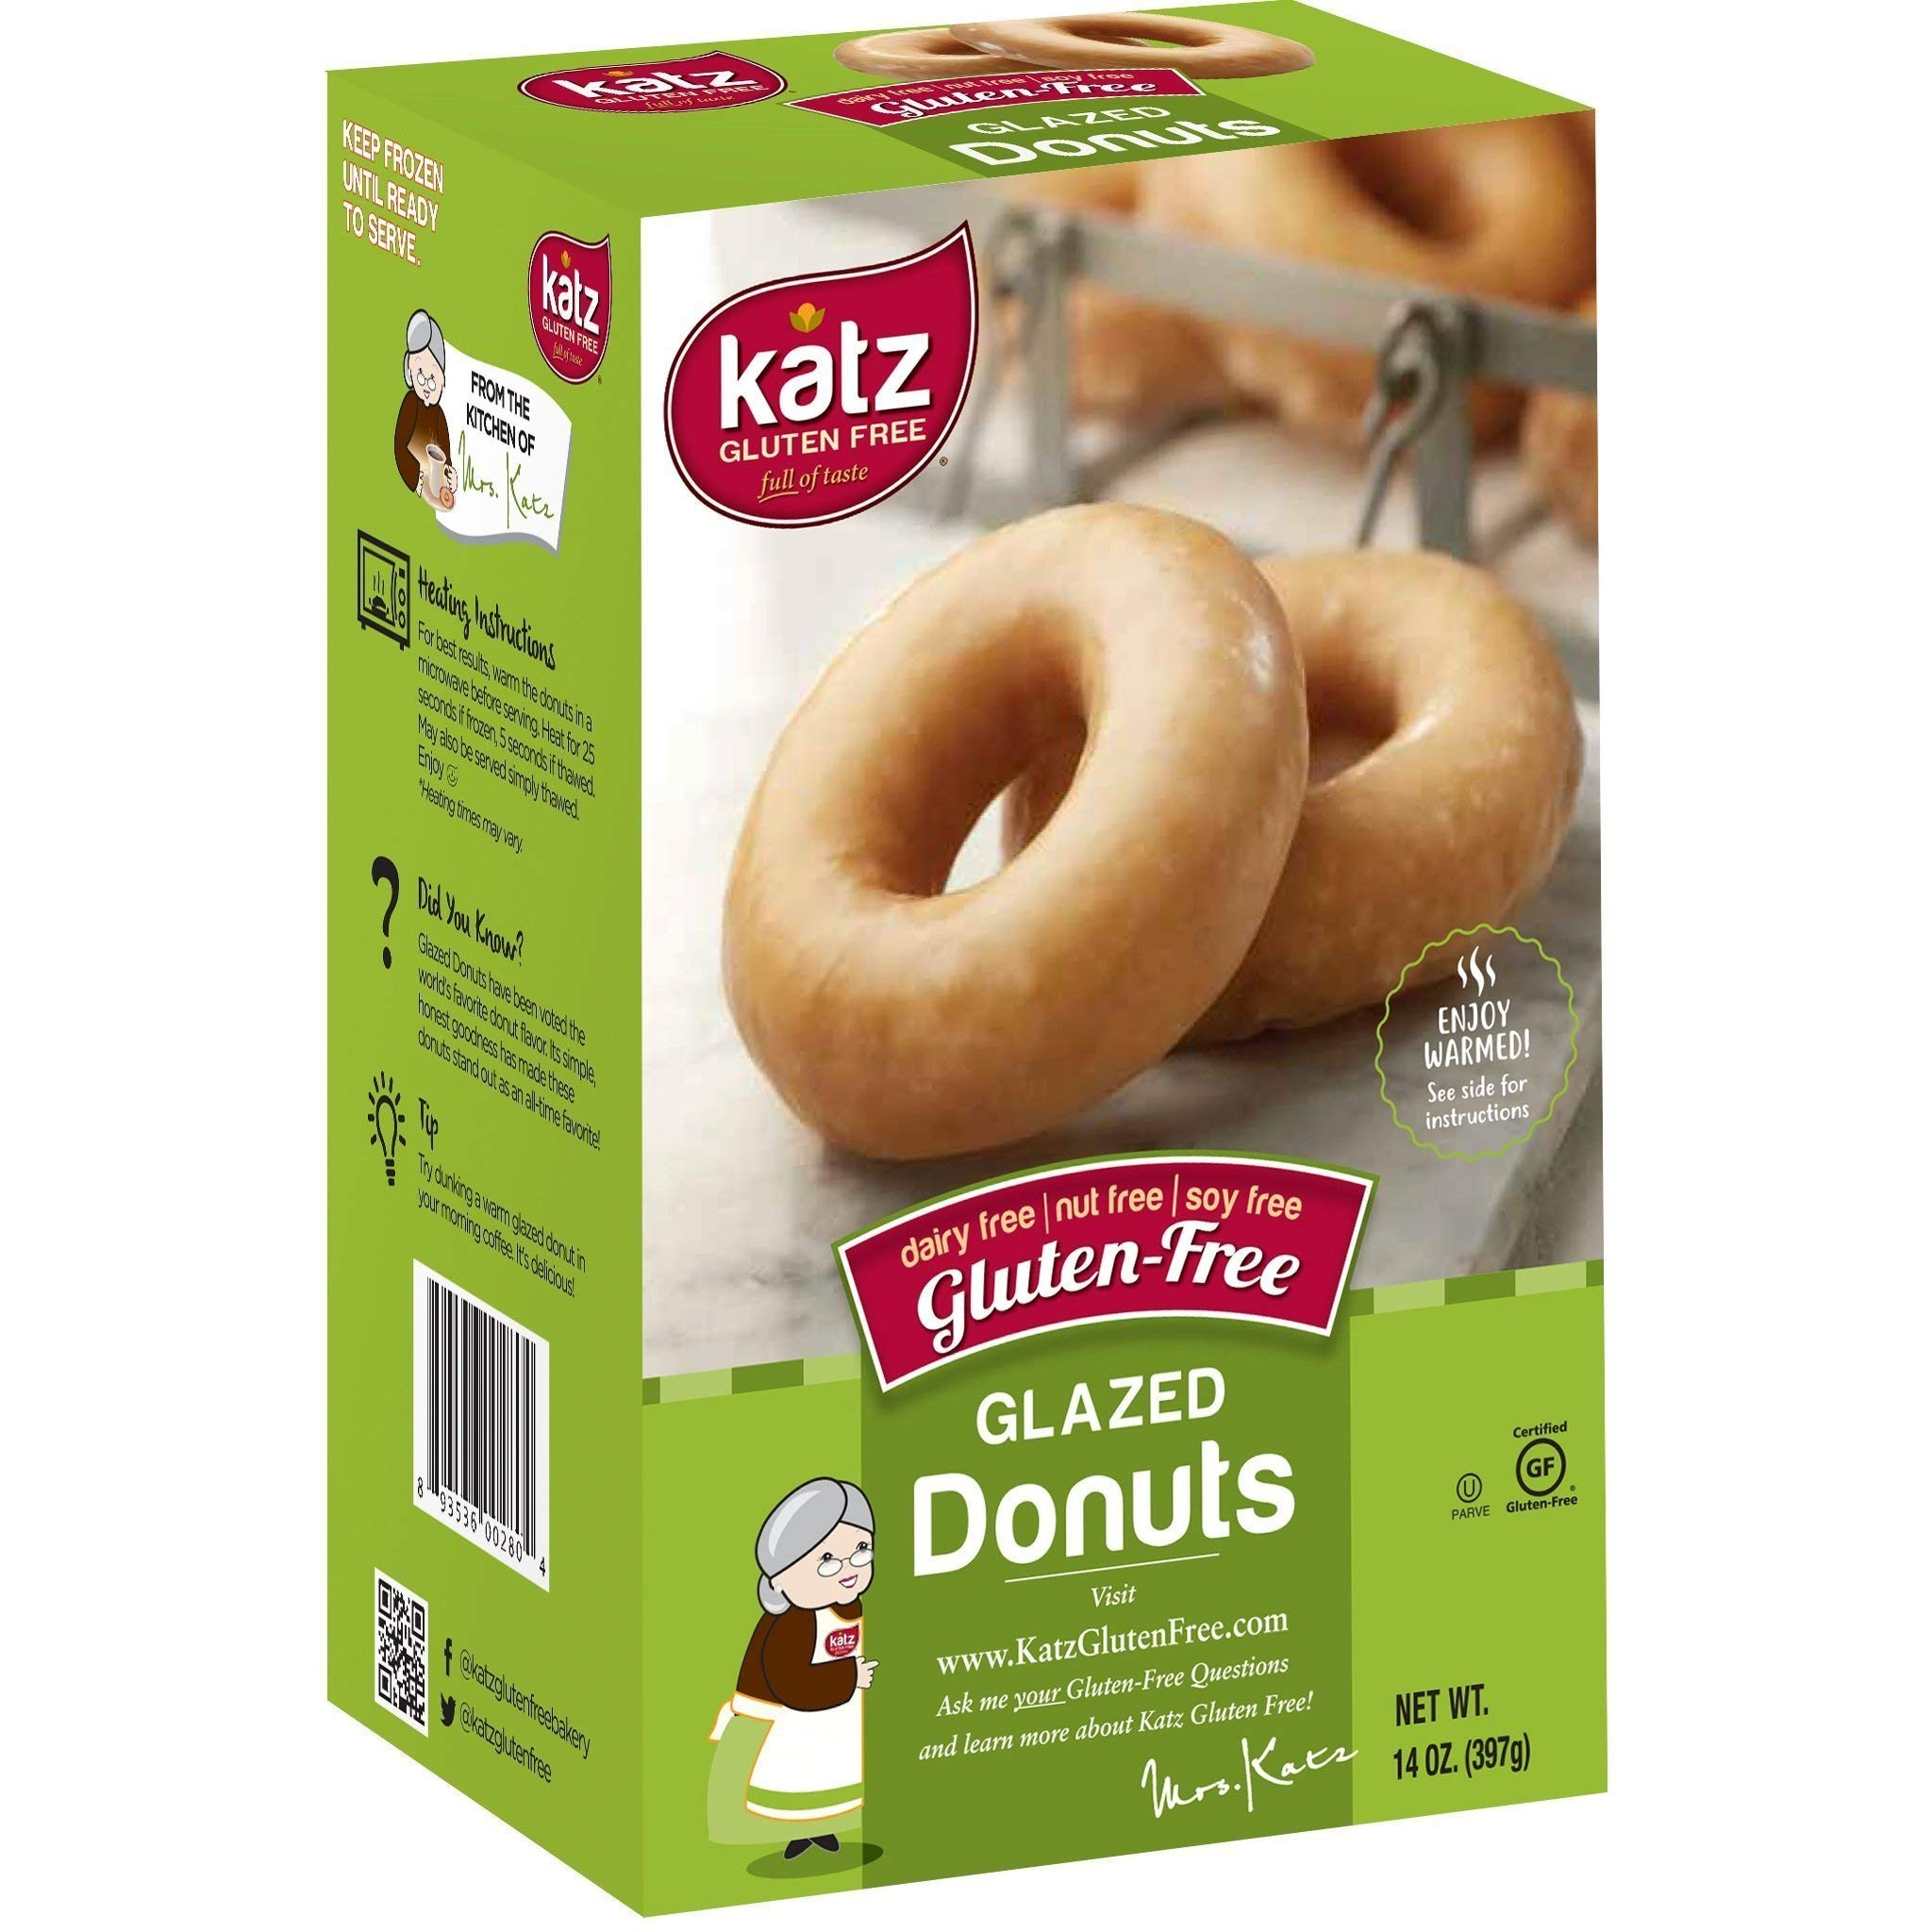 Katz Gluten Free Glazed Donuts | Dairy, Nut, Soy and Gluten Free | Kosher (6 Packs of 6 Donuts, 14 Ounce Each) by Katz Gluten Free